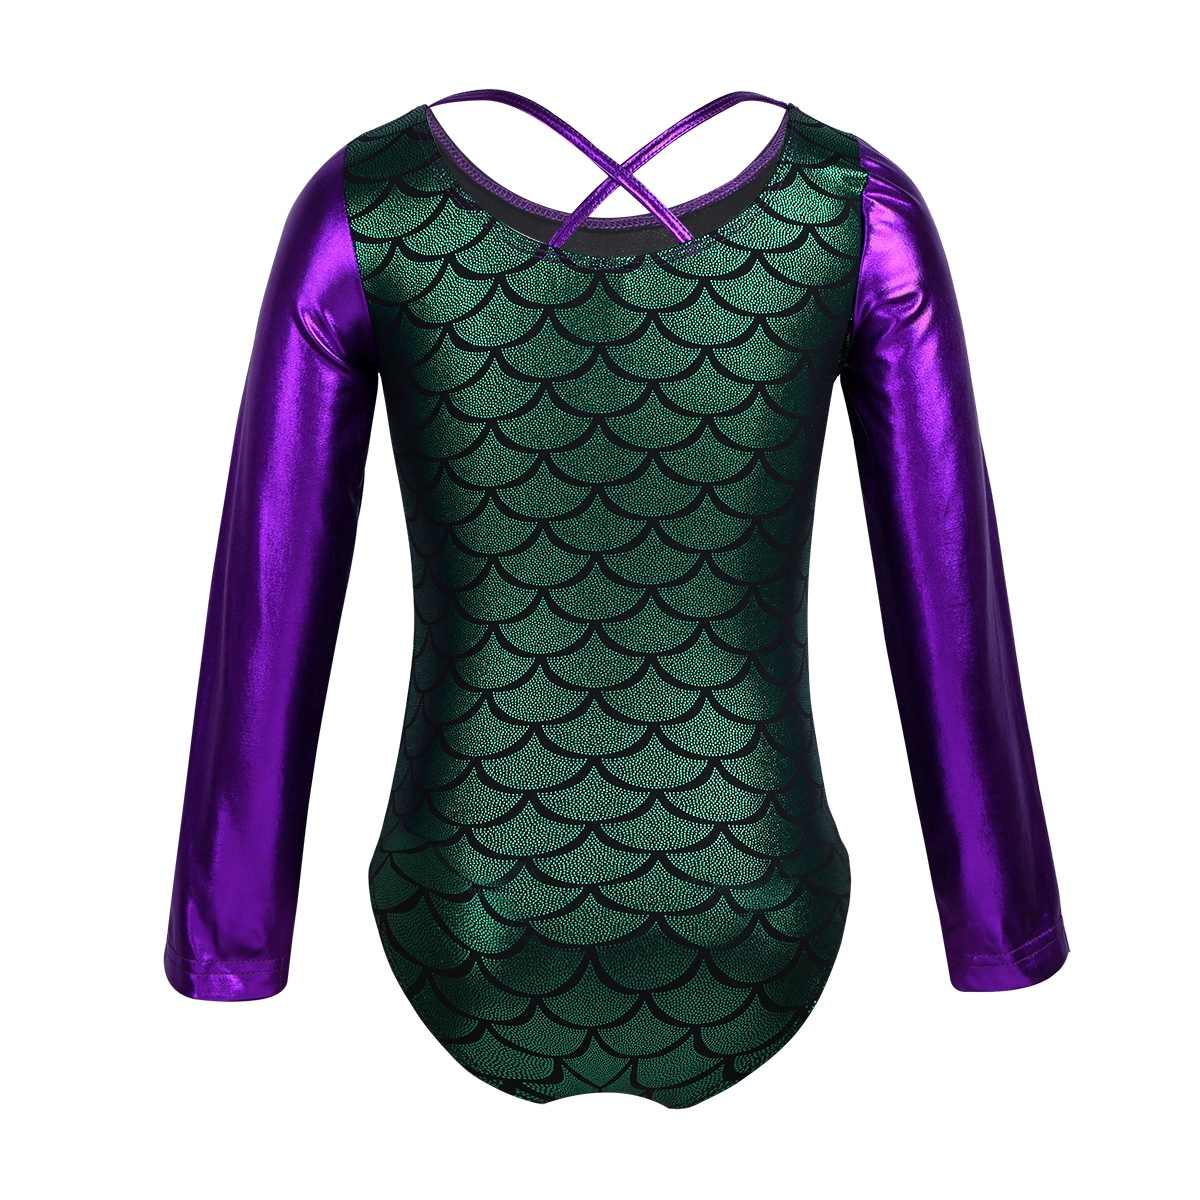 Kids Girls Gymnastics Swimsuit for Dancing Glittery Dance Bodysuit Scales Printed Splice Ballet Tutu Costumes Leotard Dancewear